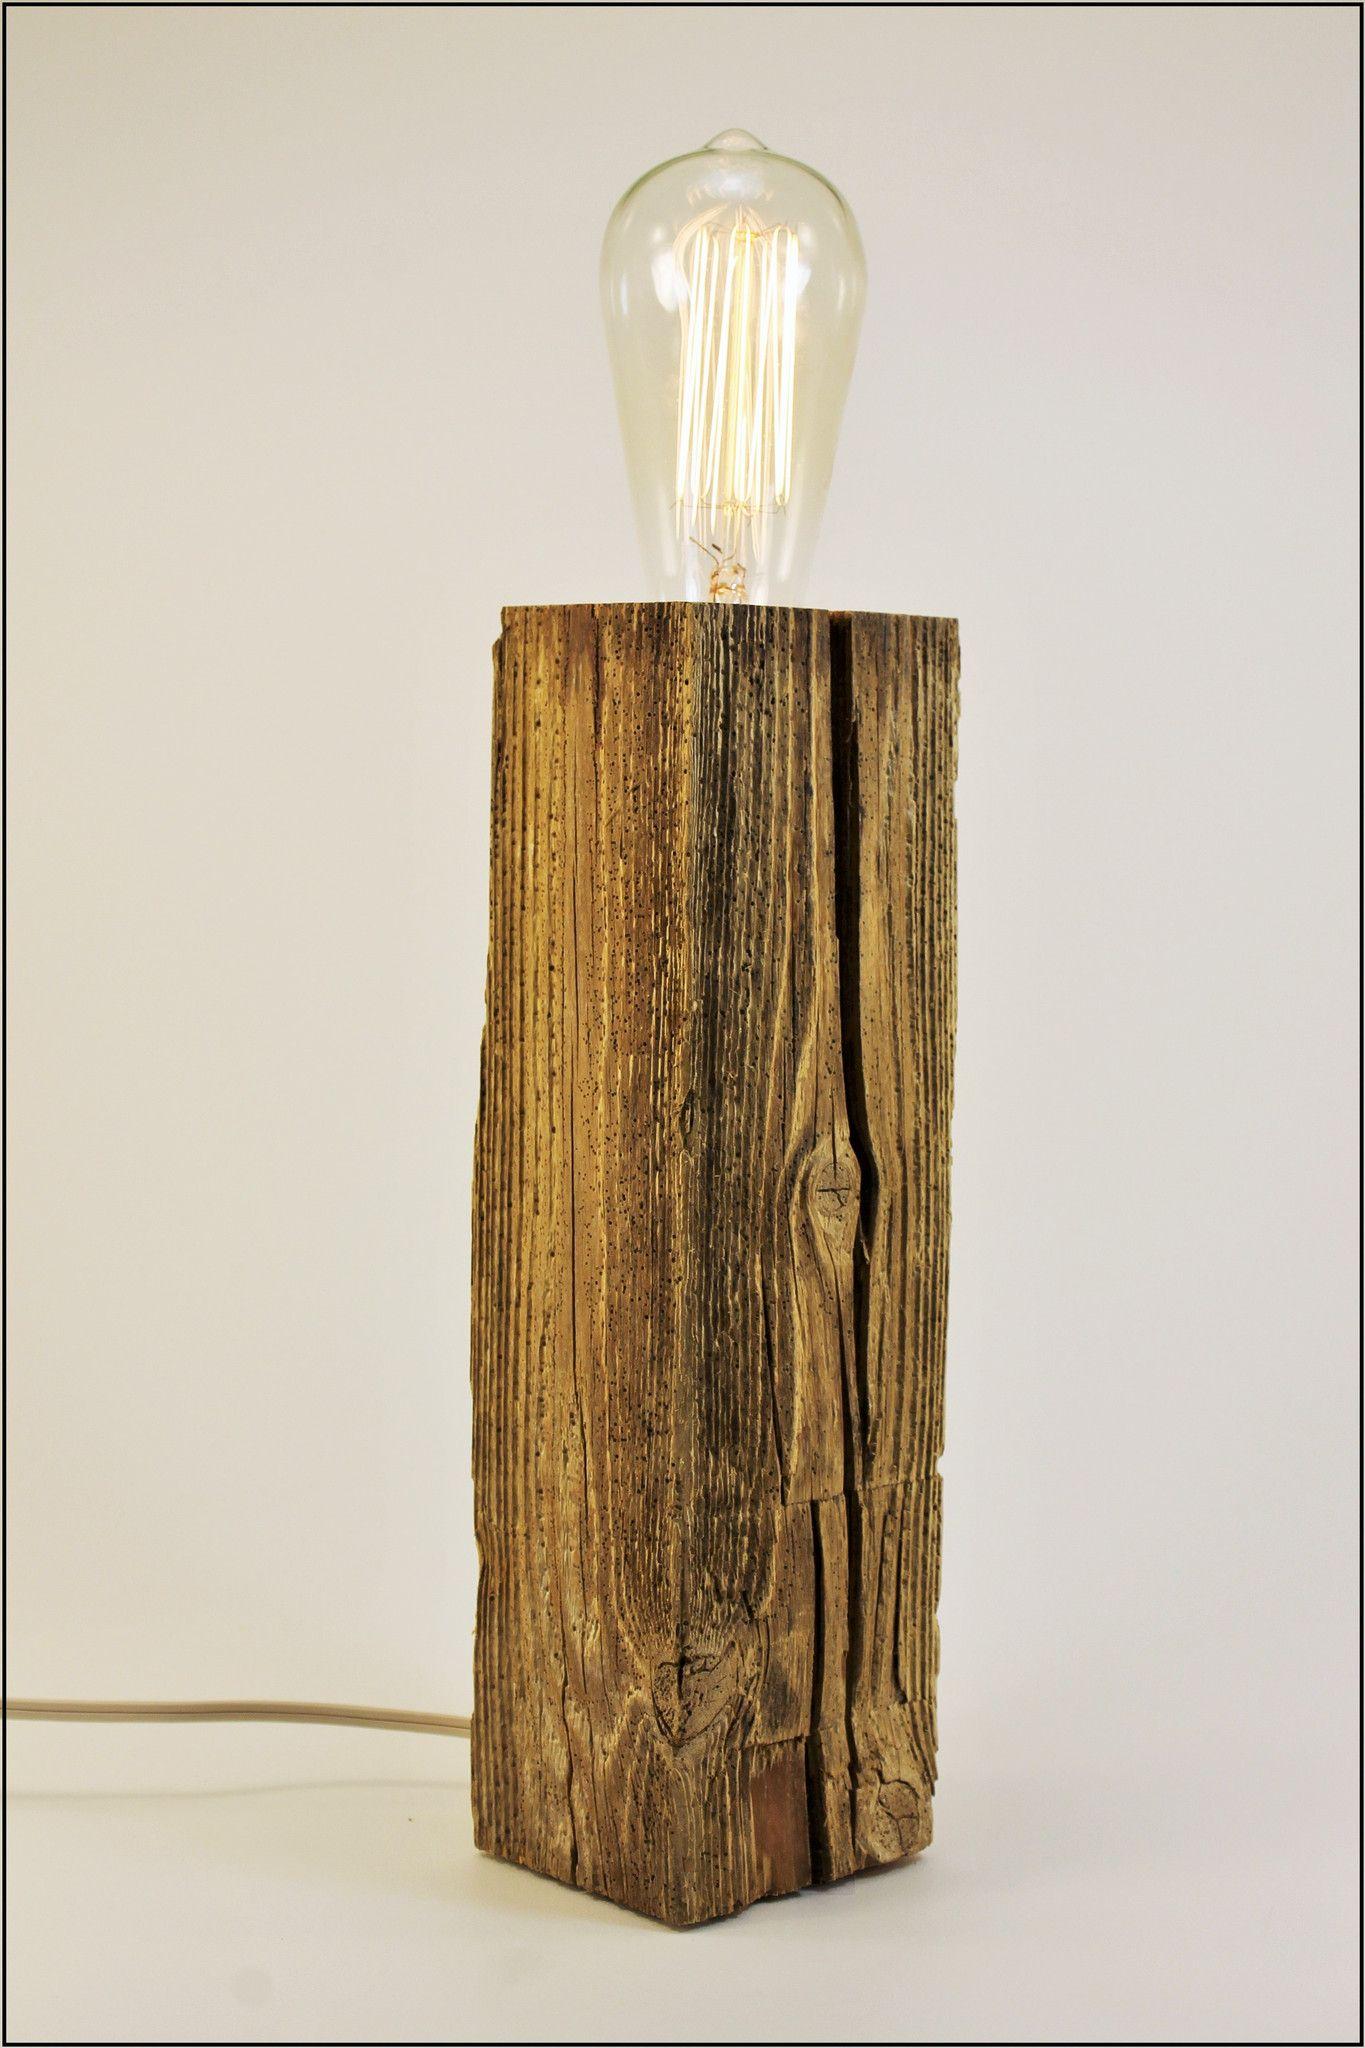 Shabby Chic Reclaimed Wood Table Lamp Natural Driftwood Id Lights Shabby Chic Interiors Shabby Chic Diy Shabby Chic Room